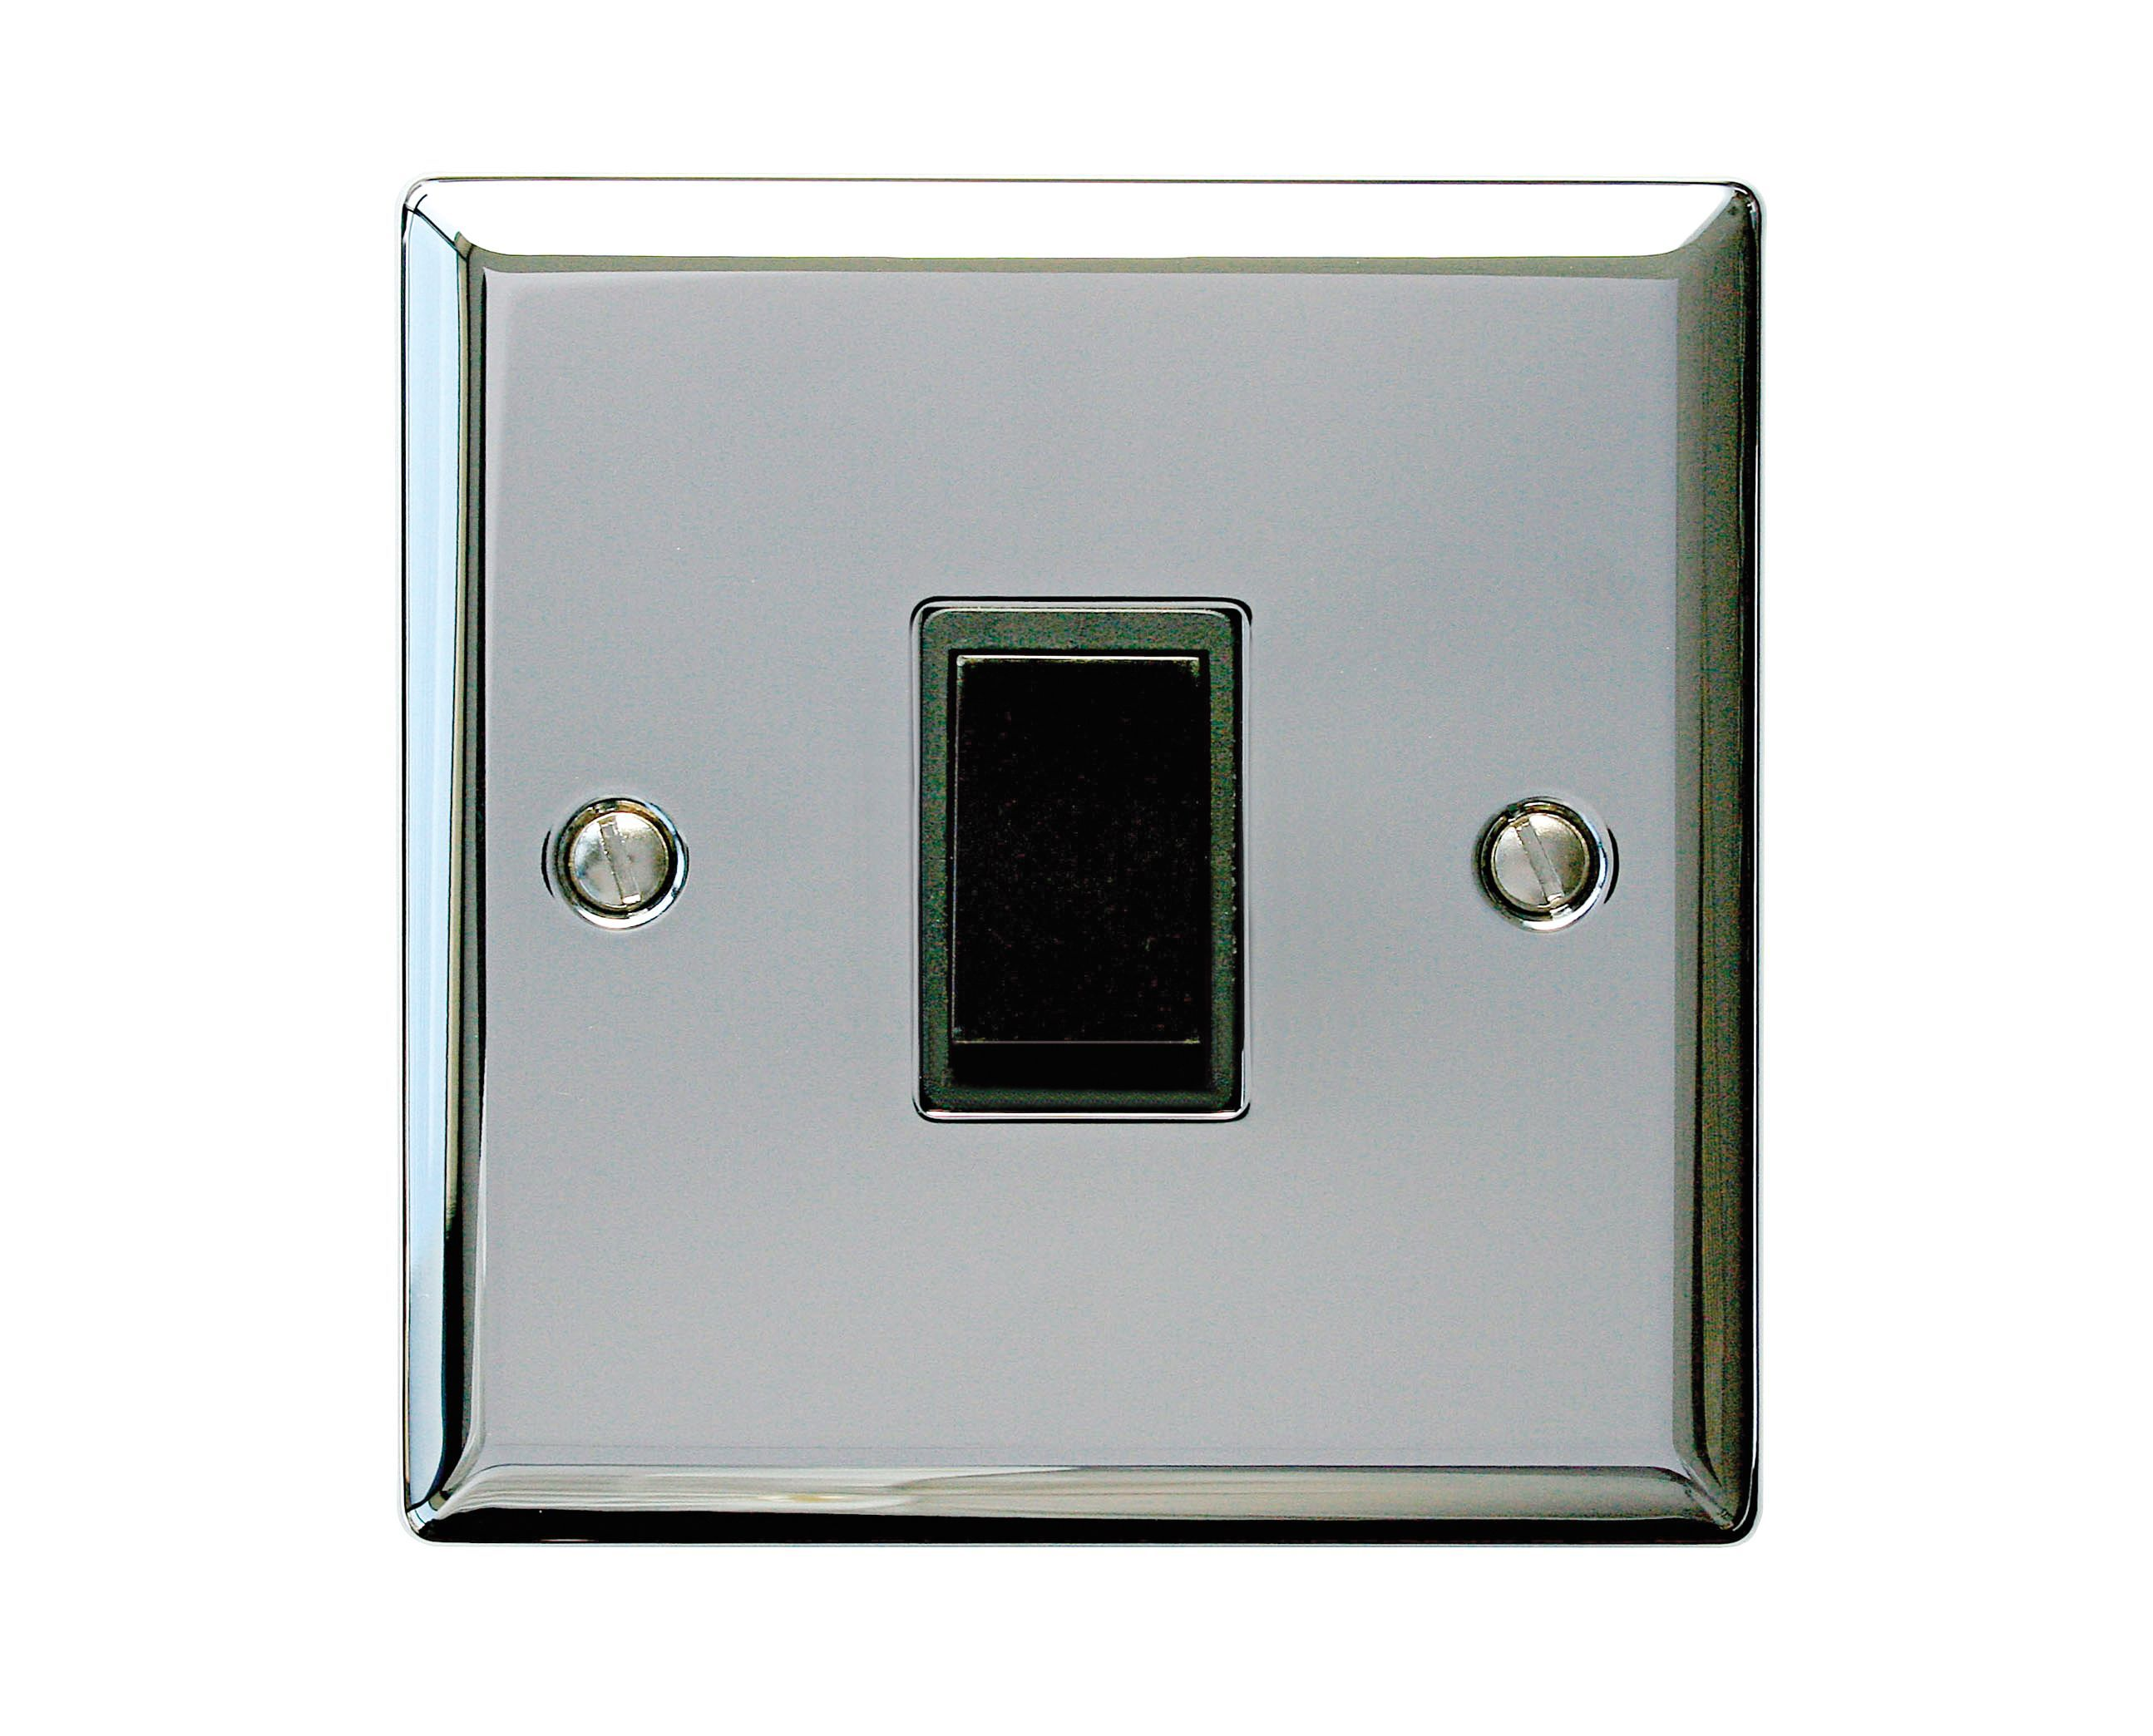 holder 10a 2 way single polished chrome light switch. Black Bedroom Furniture Sets. Home Design Ideas